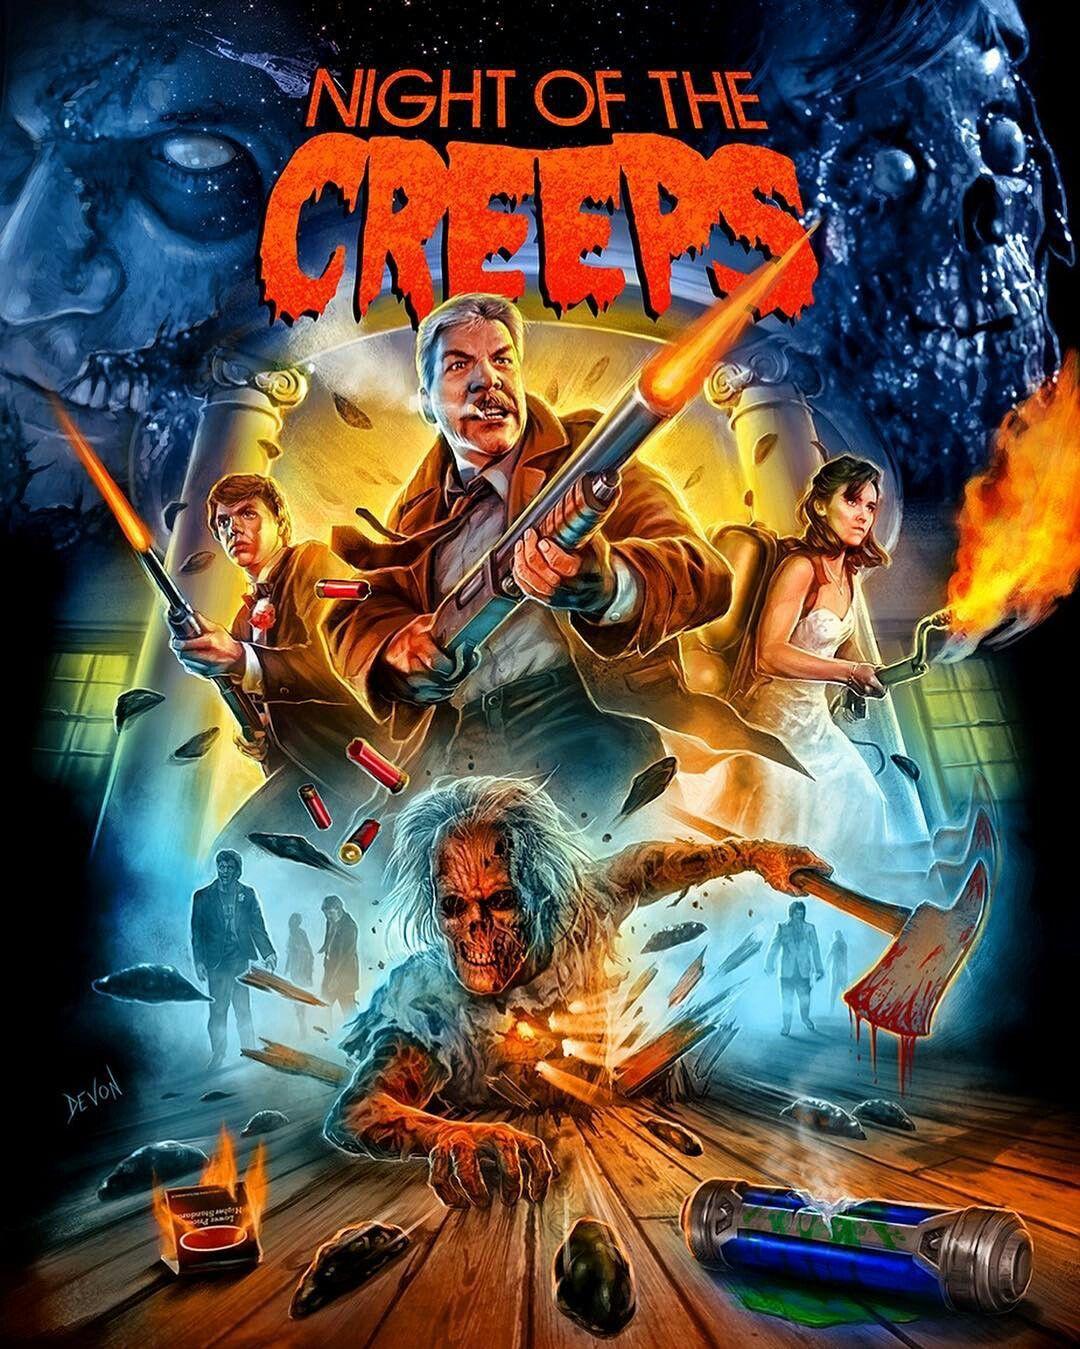 Pin by april adkison on horror is best horror movie art